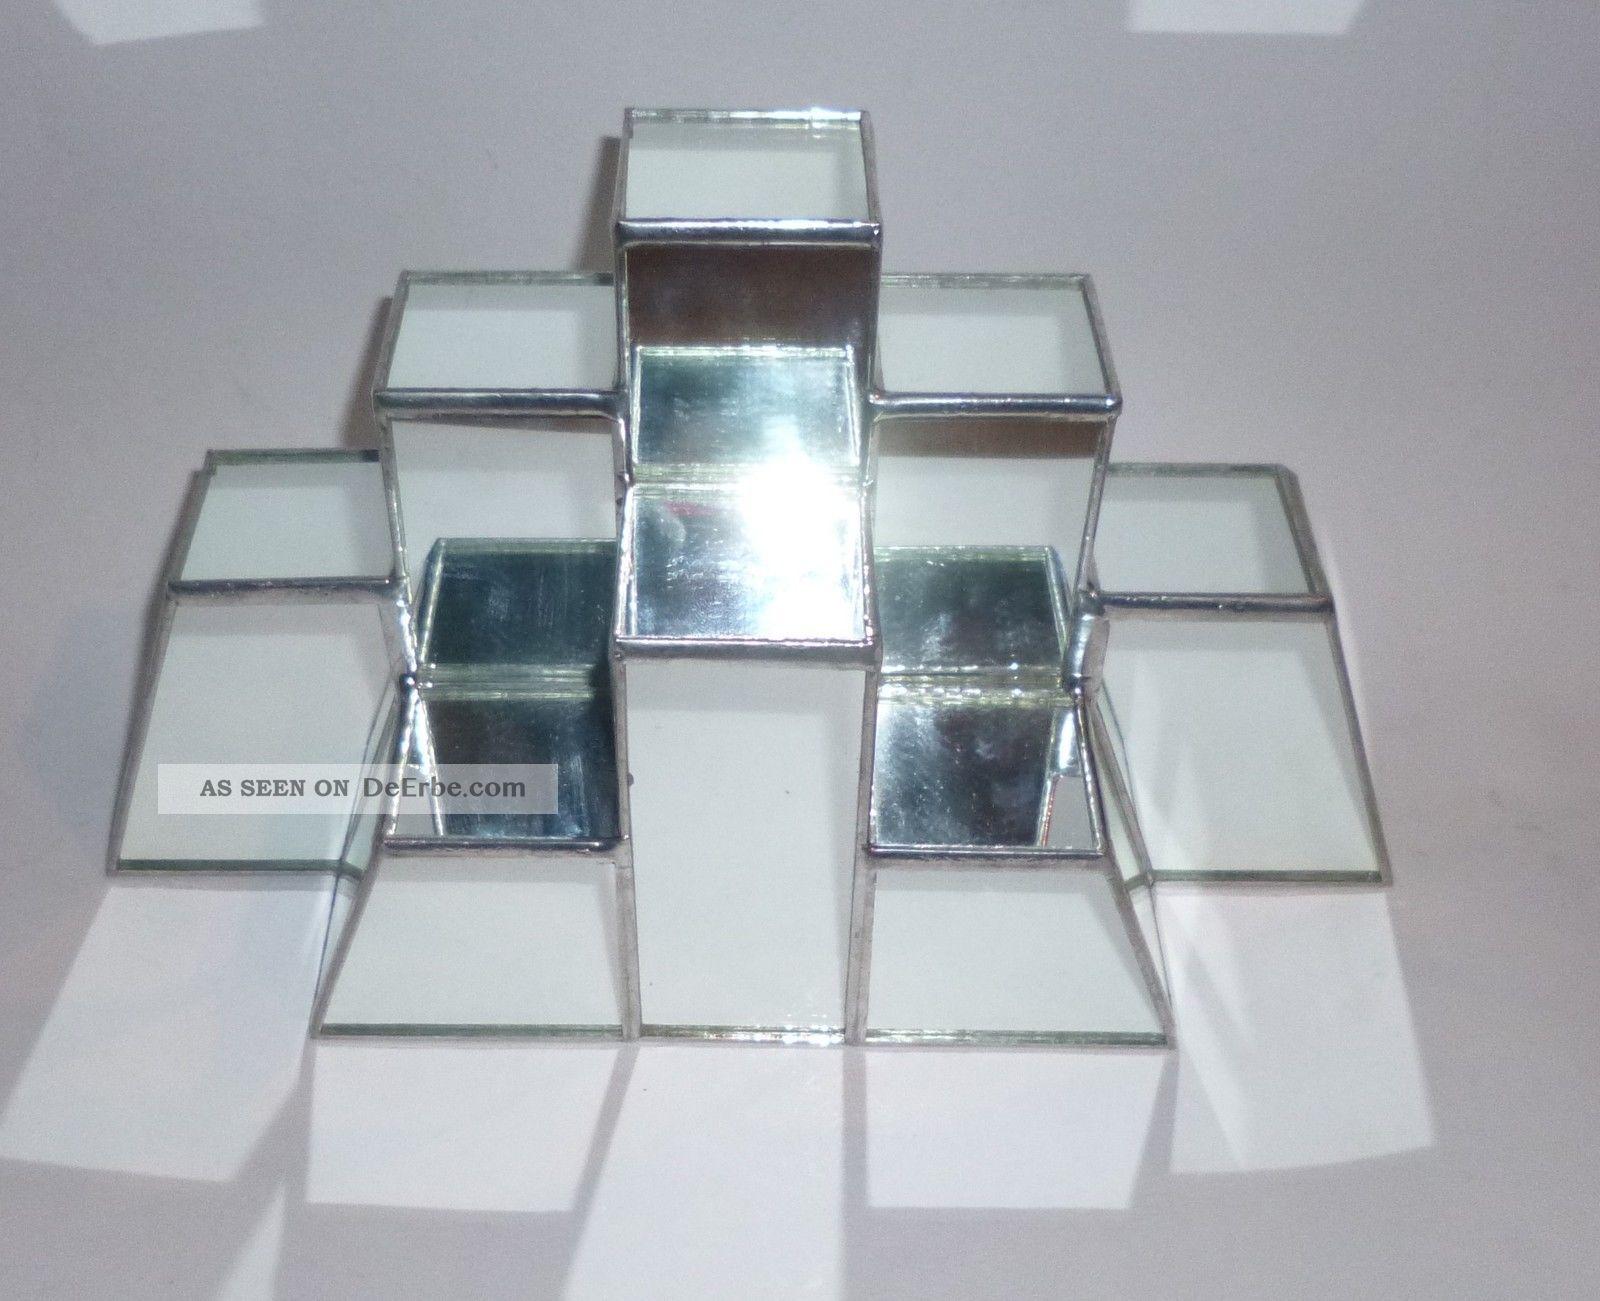 glas spiegel pyramide bleiverglasung treppe sammler figuren etc ablage deko. Black Bedroom Furniture Sets. Home Design Ideas